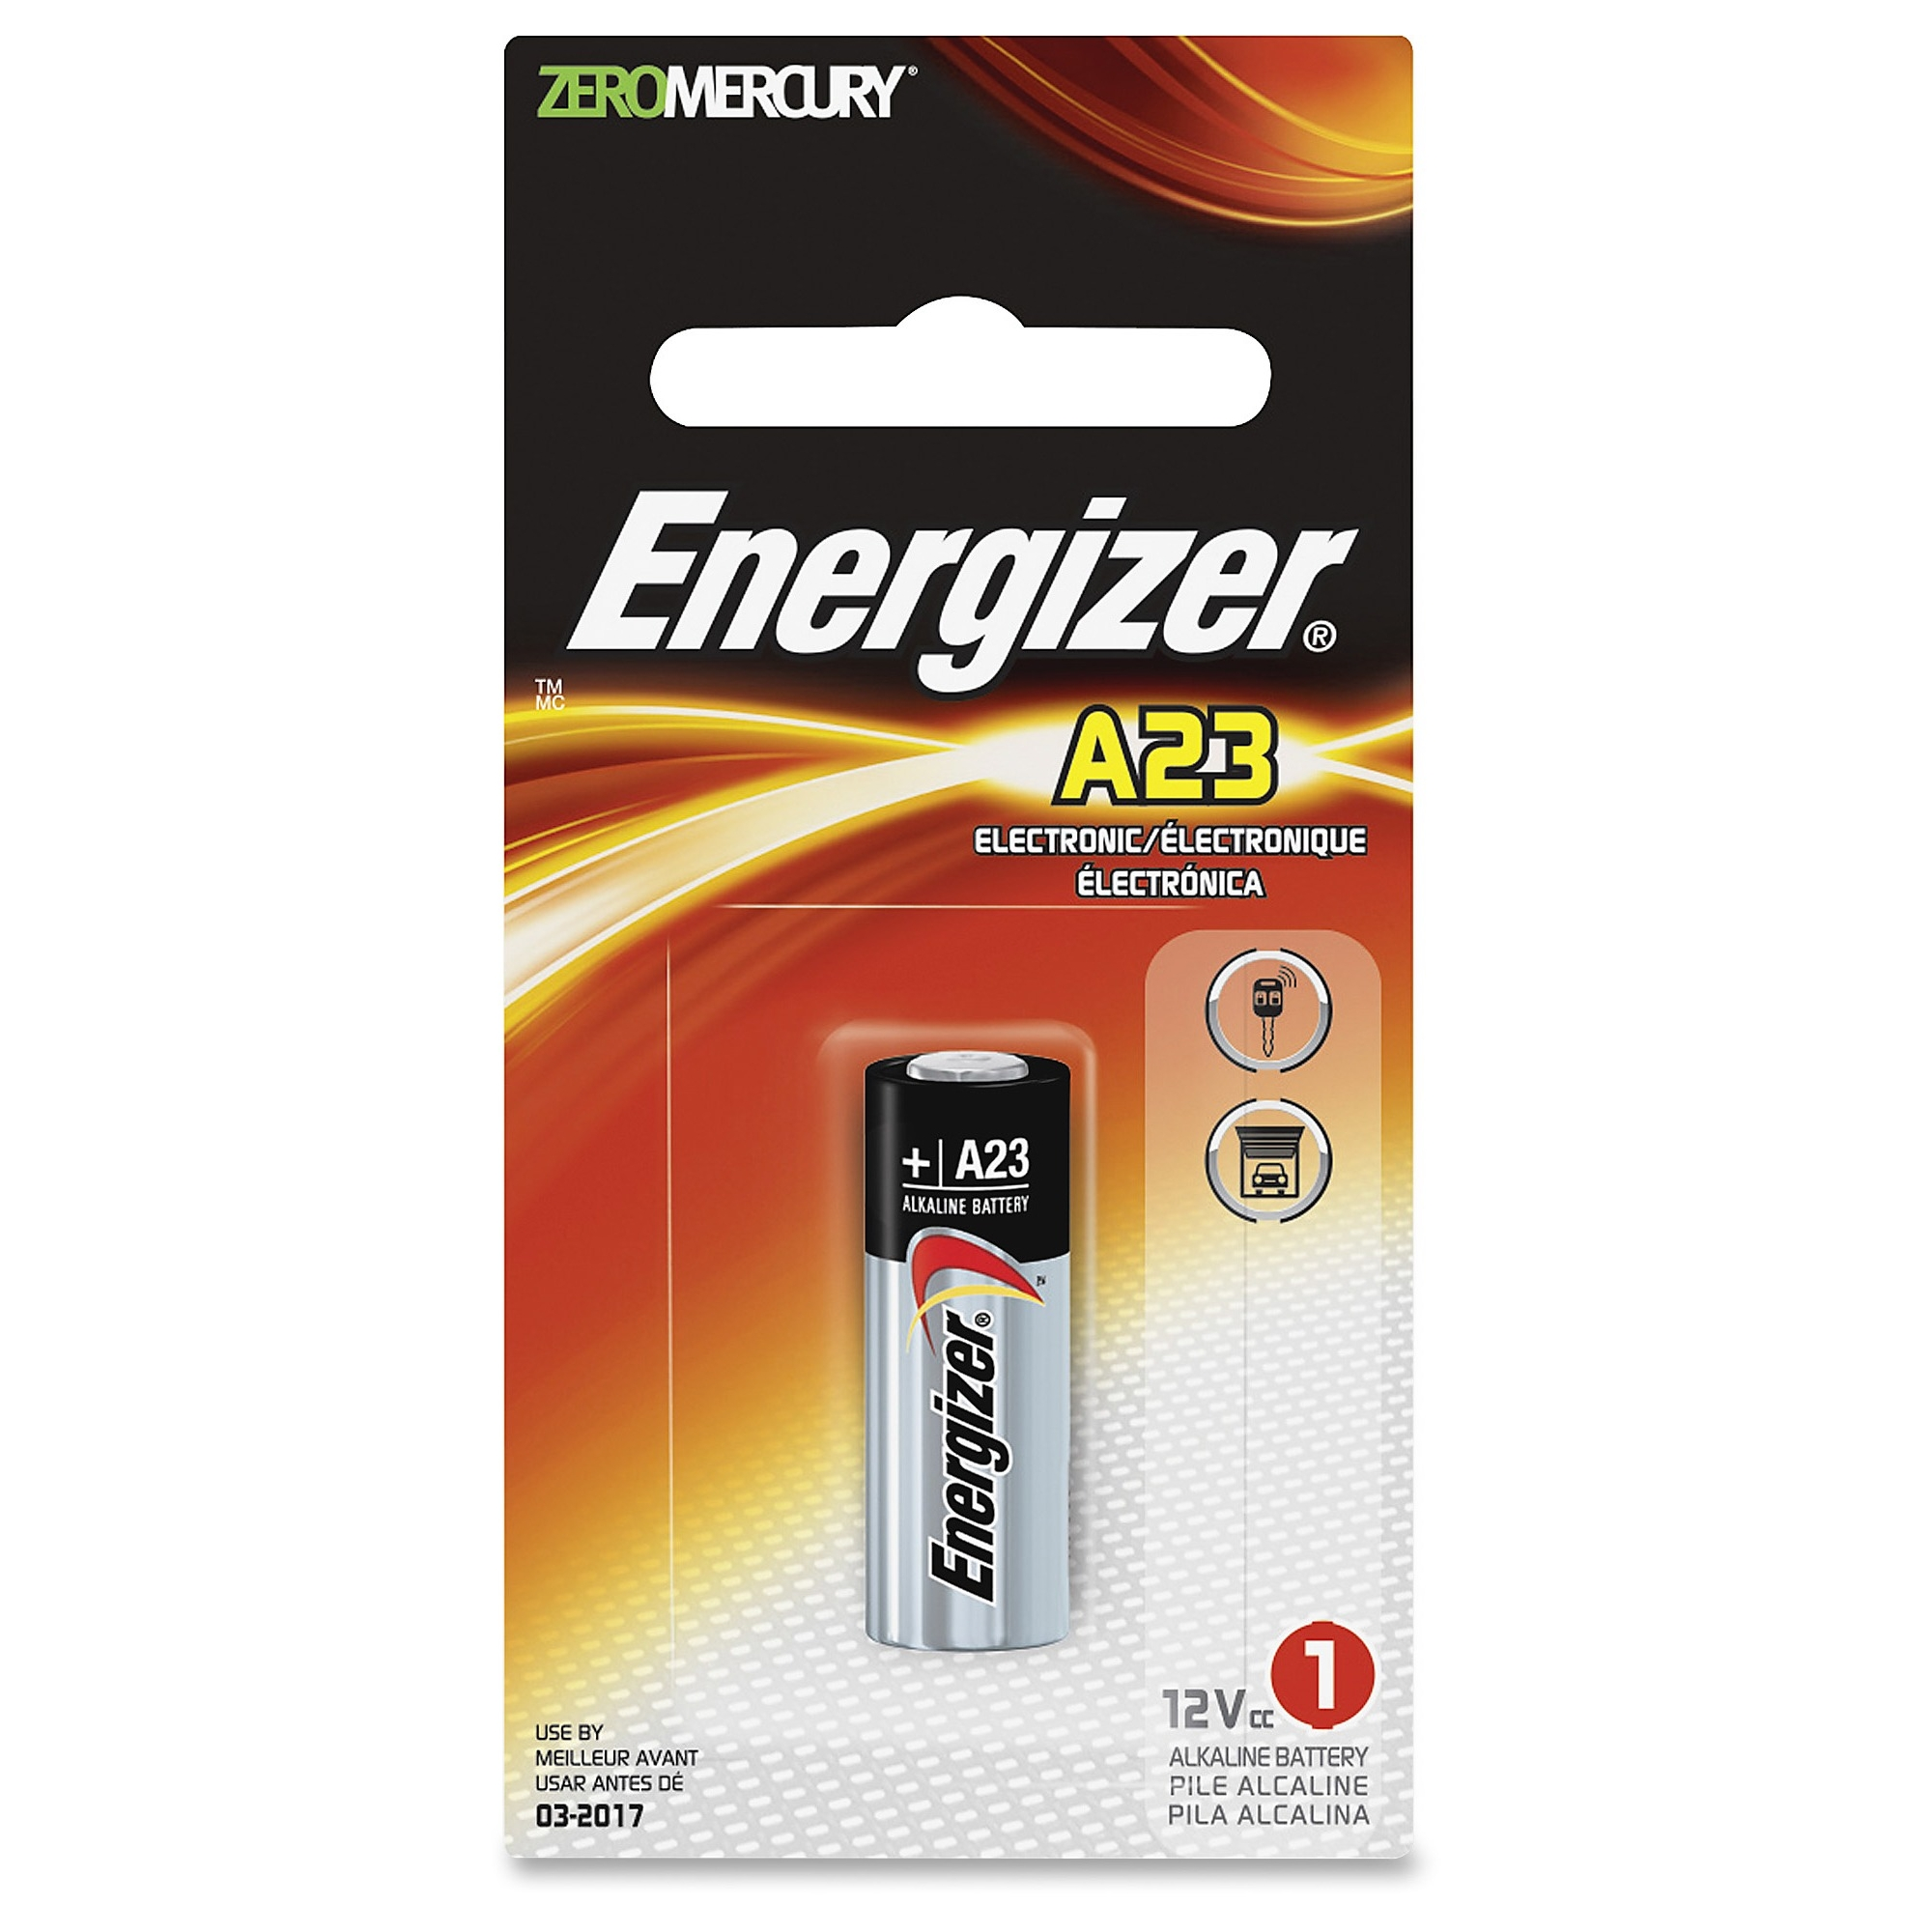 Eveready Energizer A23 Electronic 12v Alkaline Battery - ...